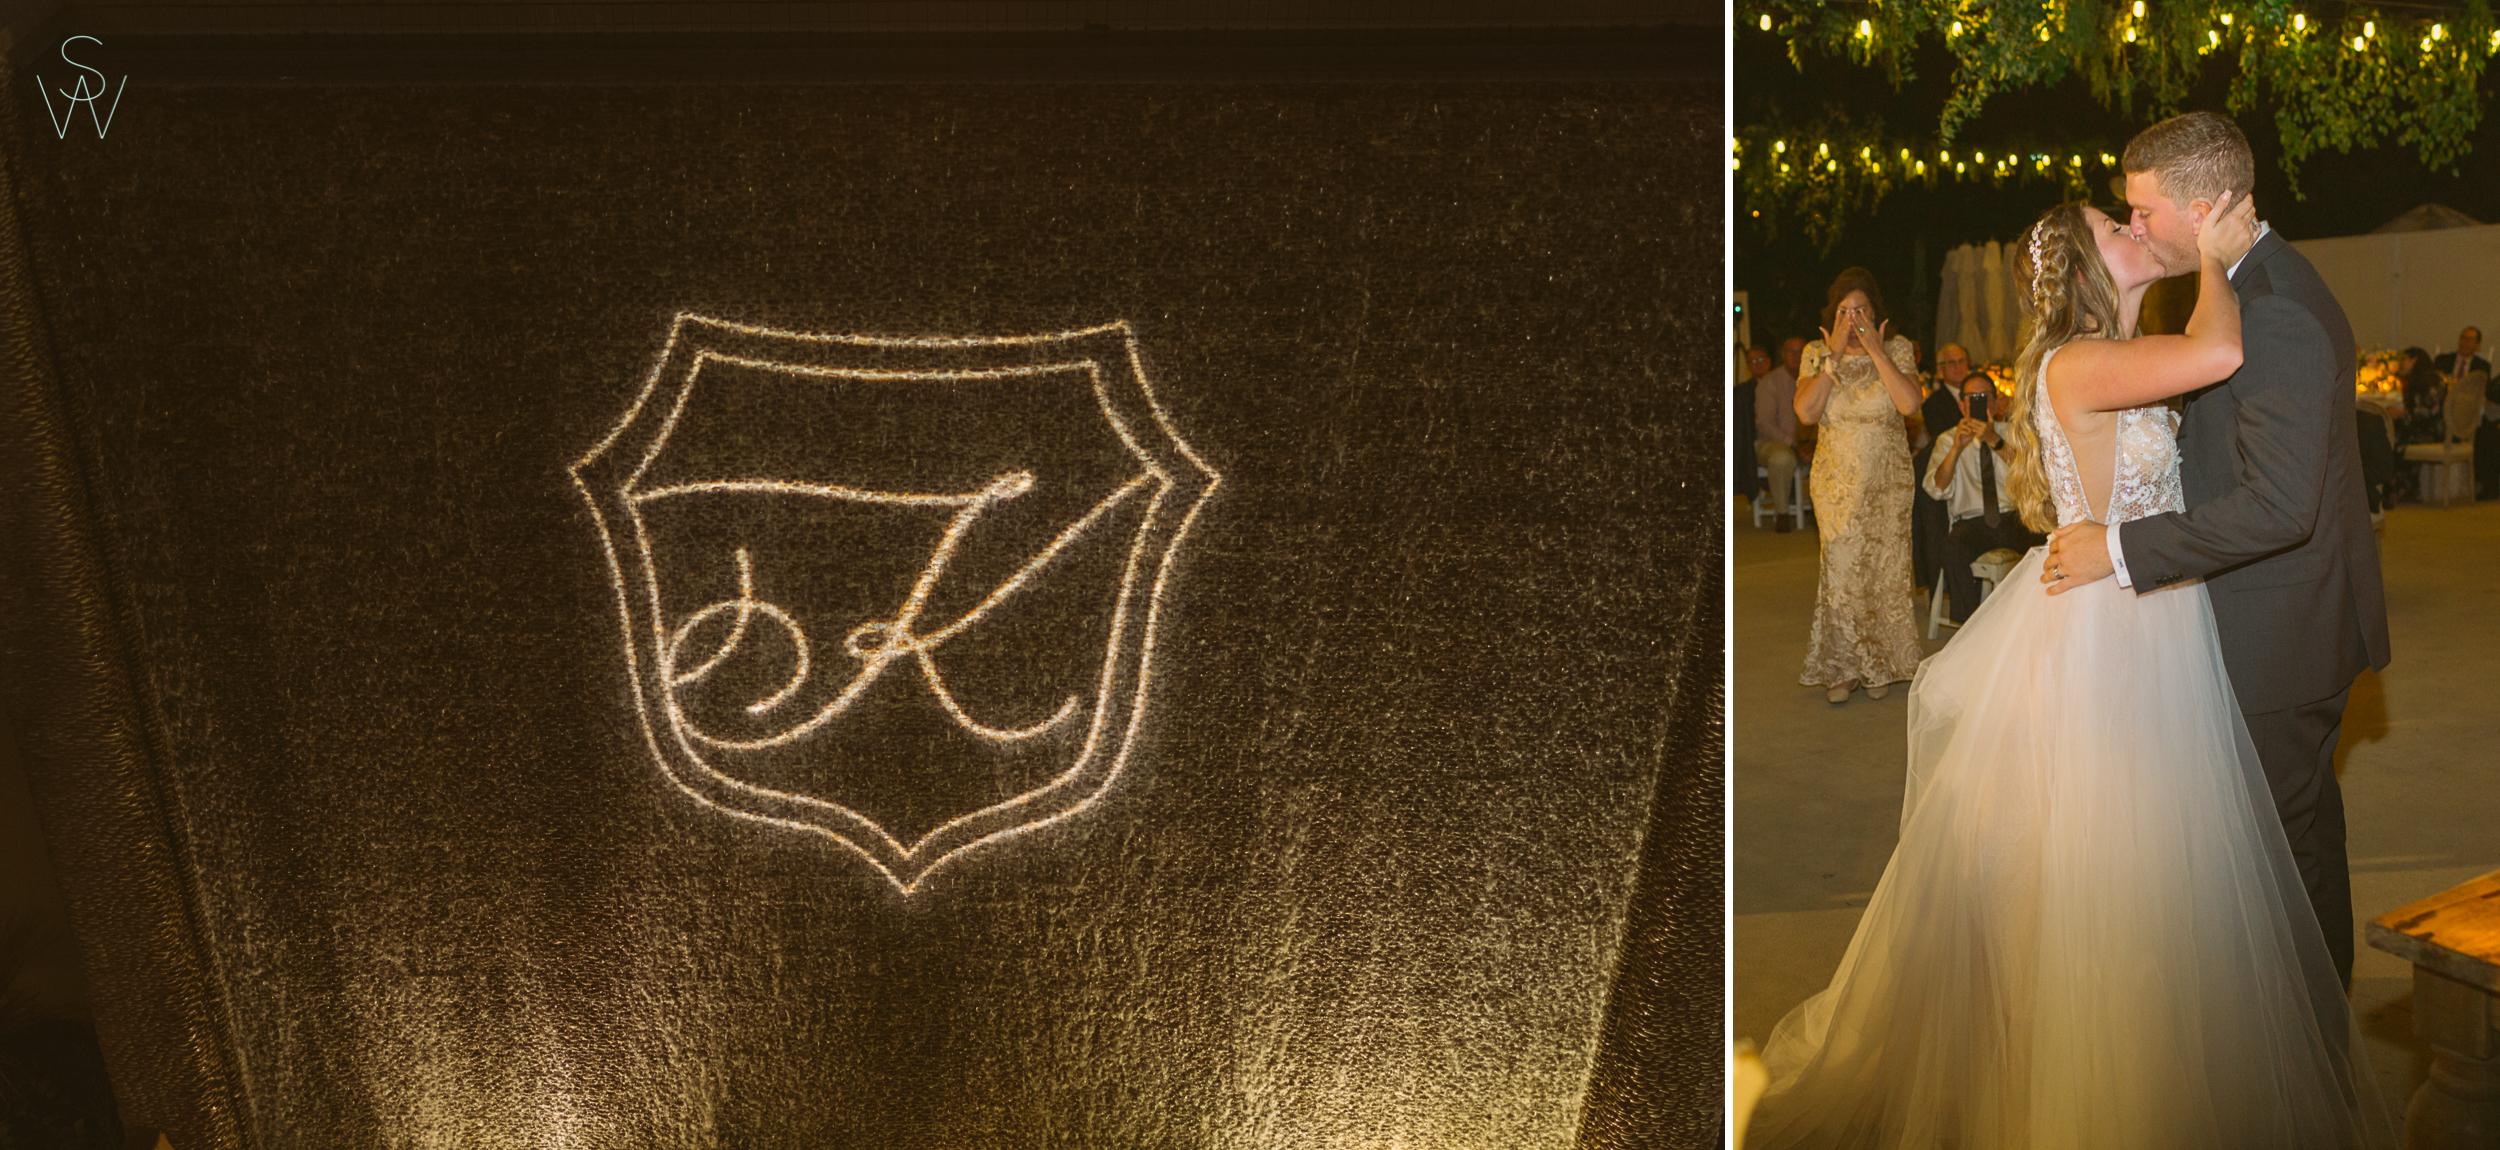 227Lauberge.shewanders.wedding.photography.JPG